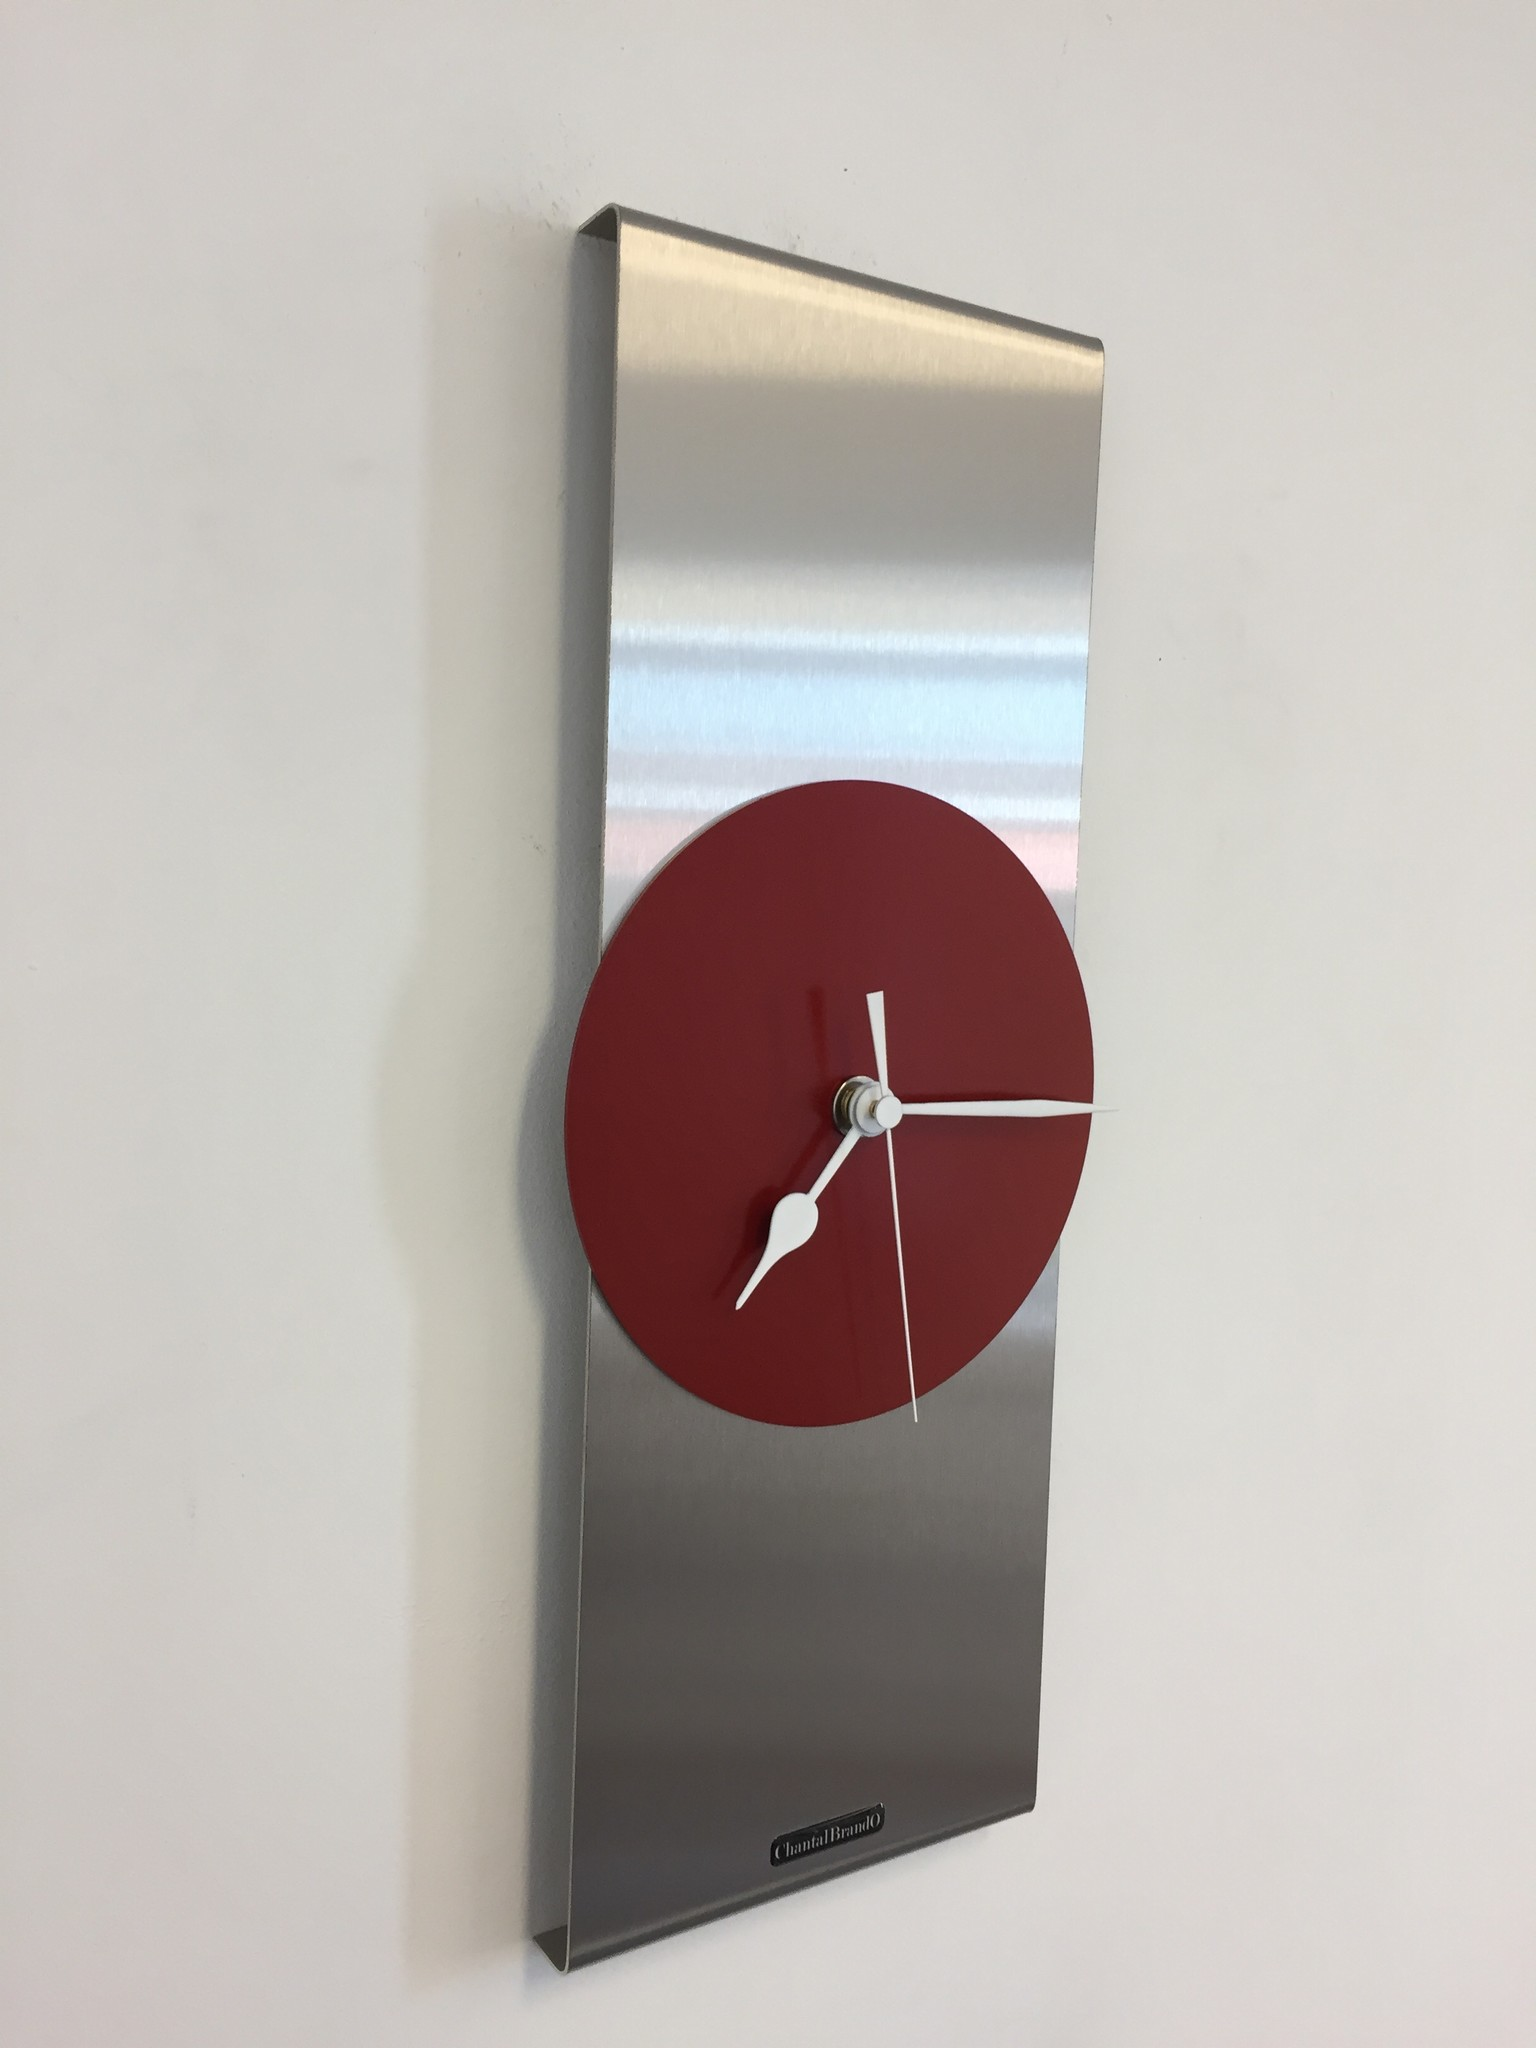 ChantalBrandO Wandklok Orion RED Modern Dutch Design